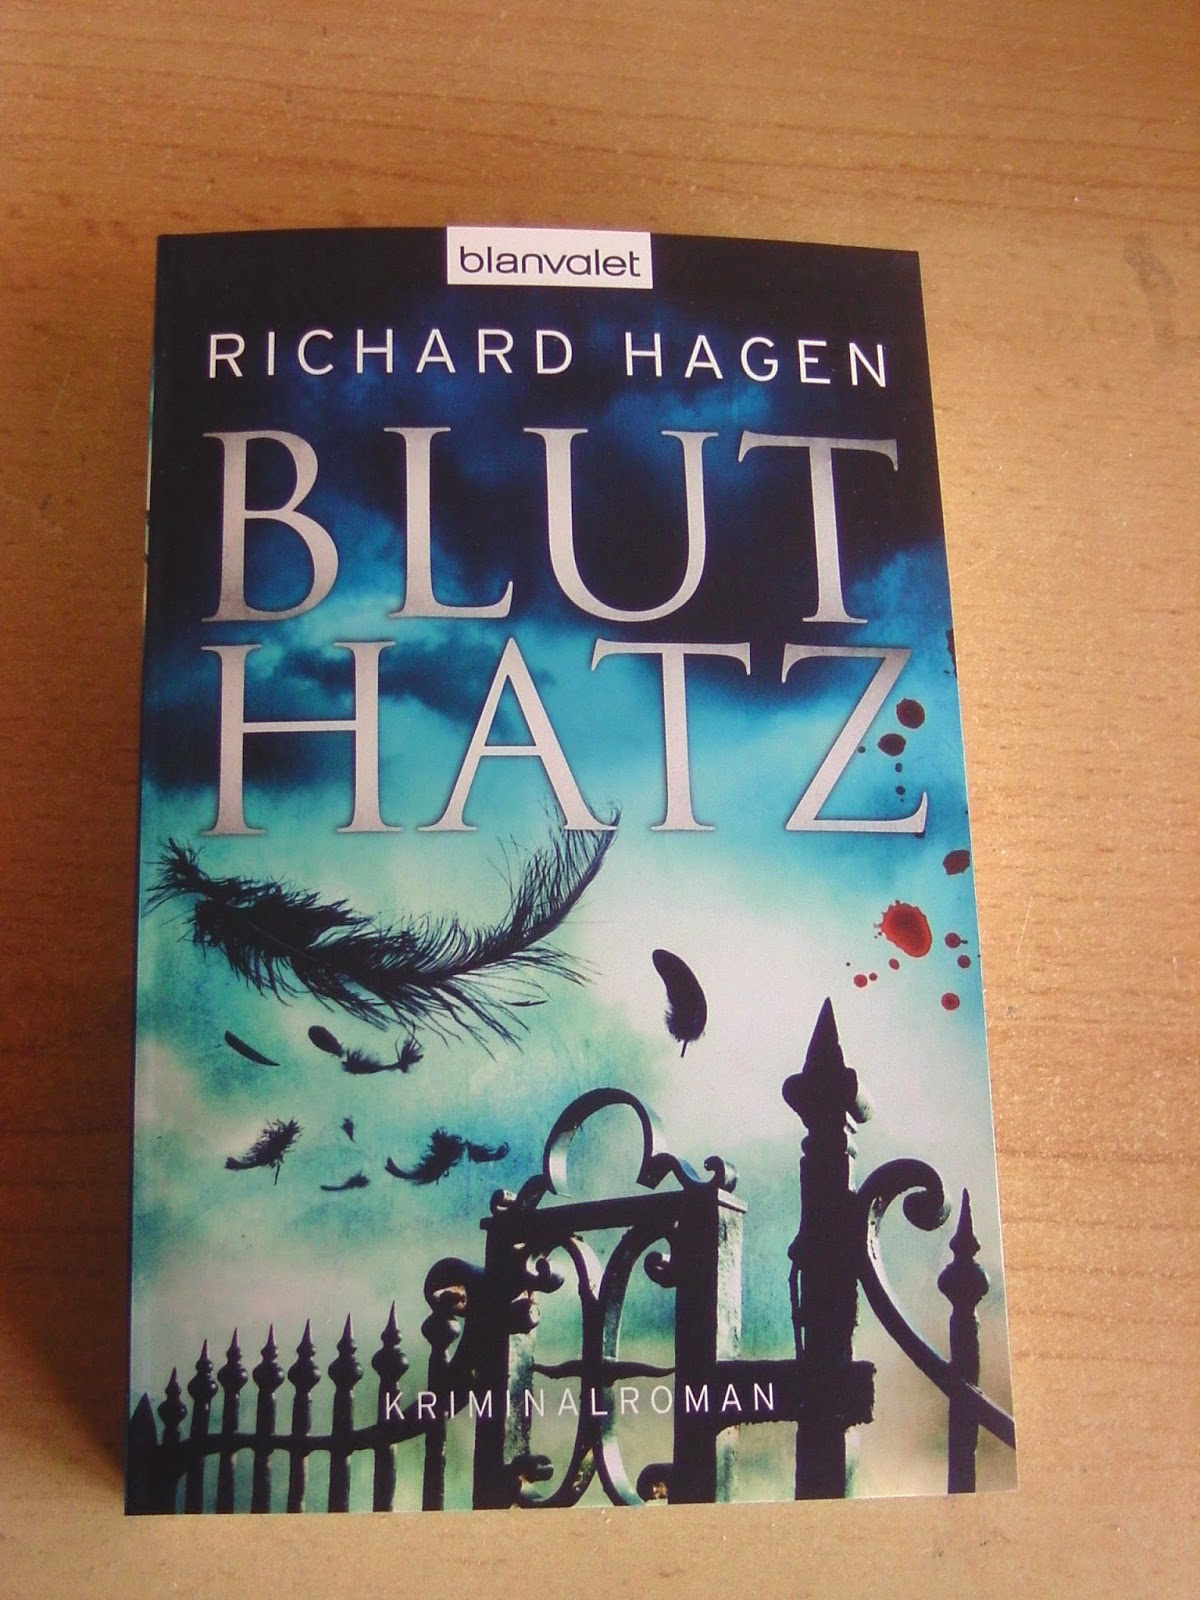 http://www.amazon.de/Bluthatz-Kriminalroman-Richard-Hagen/dp/3442383005/ref=cm_cr_pr_product_top